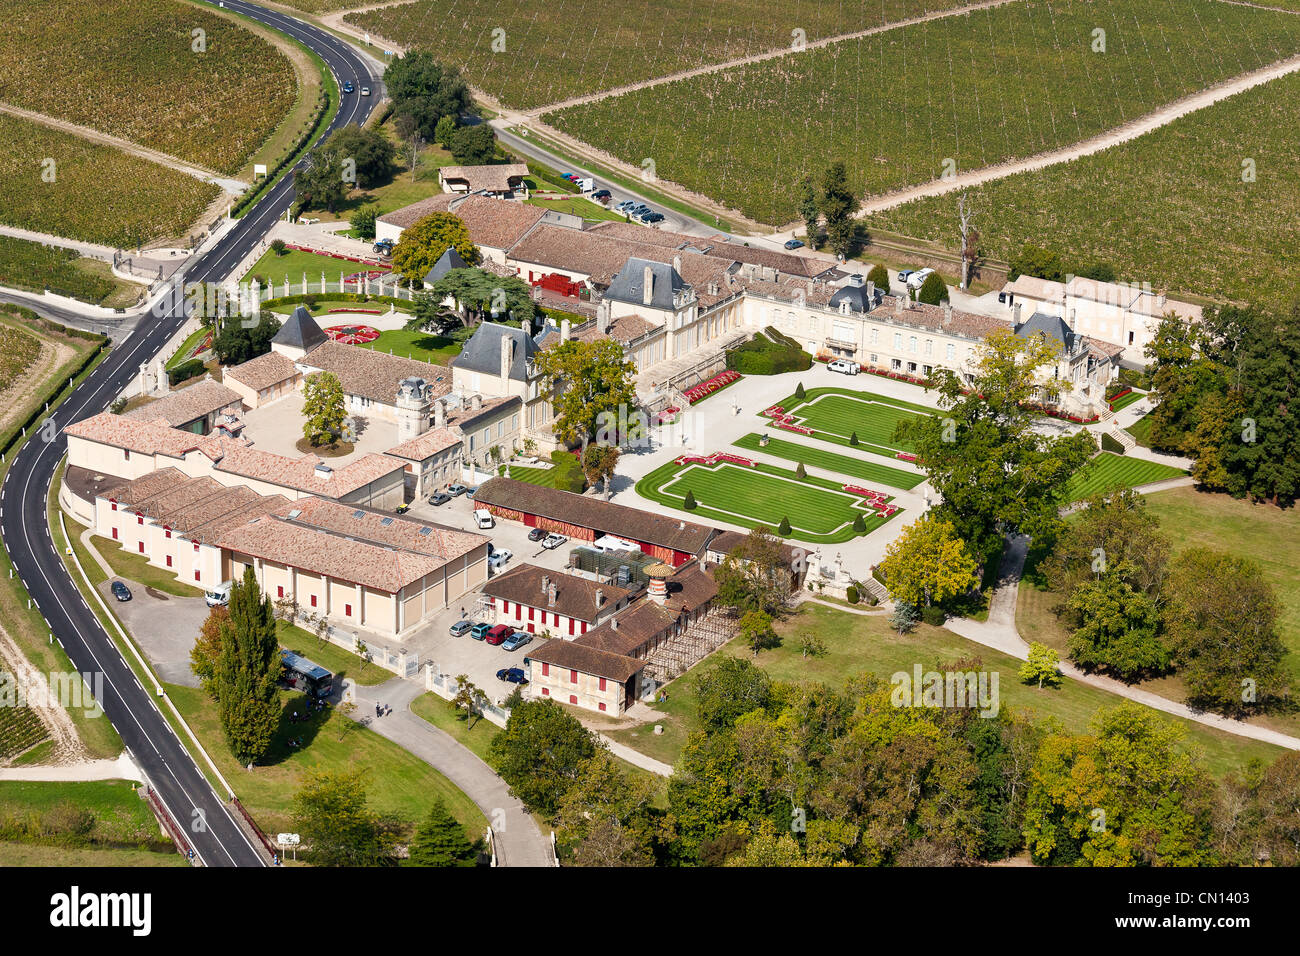 France, Gironde, Saint Julien Beychevelle, Chateau Beychevelle, 4th growth Saint Julien (aerial view) - Stock Image